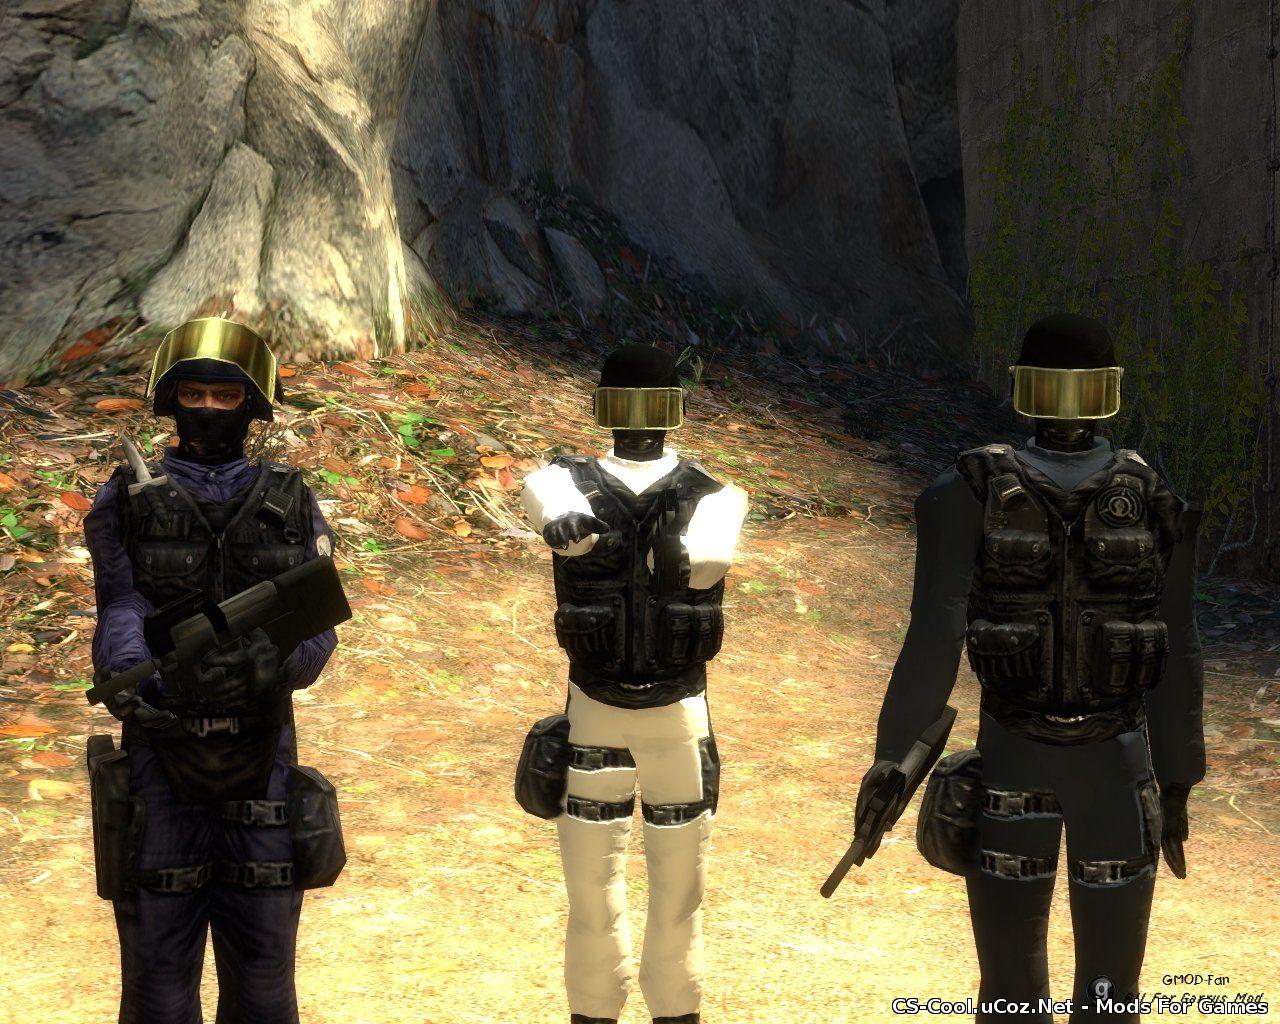 GtaManiaru скачать ГТА моды GTA игры Grand Theft Auto моды